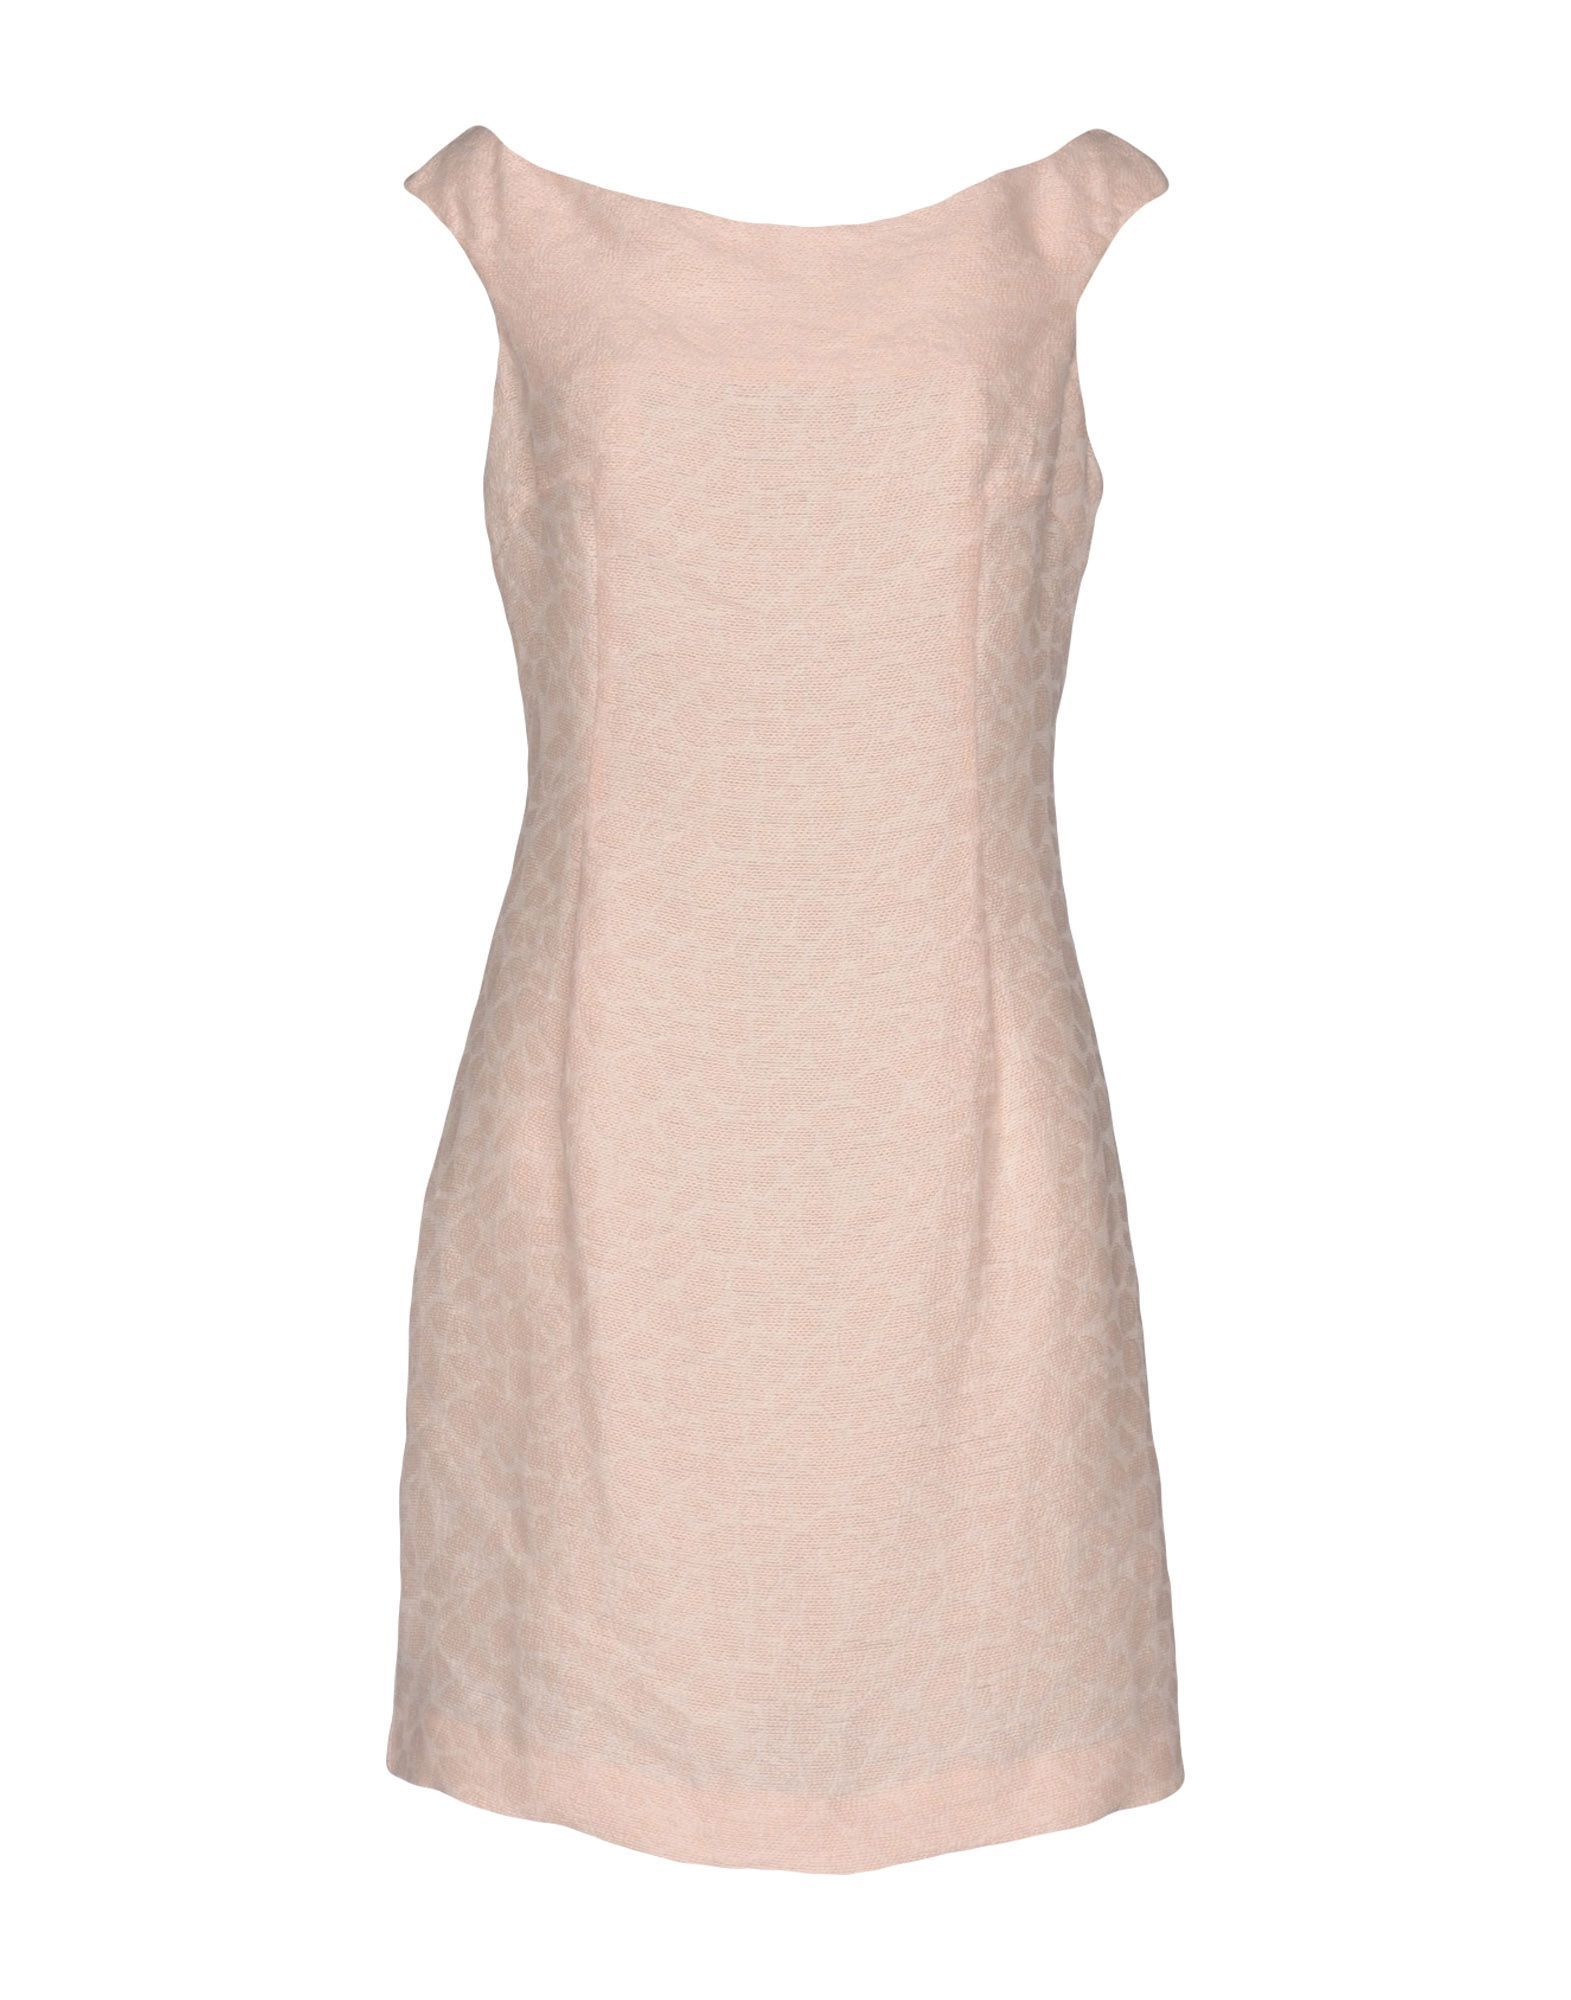 Byblos Light Pink Cotton Sleeveless Dress